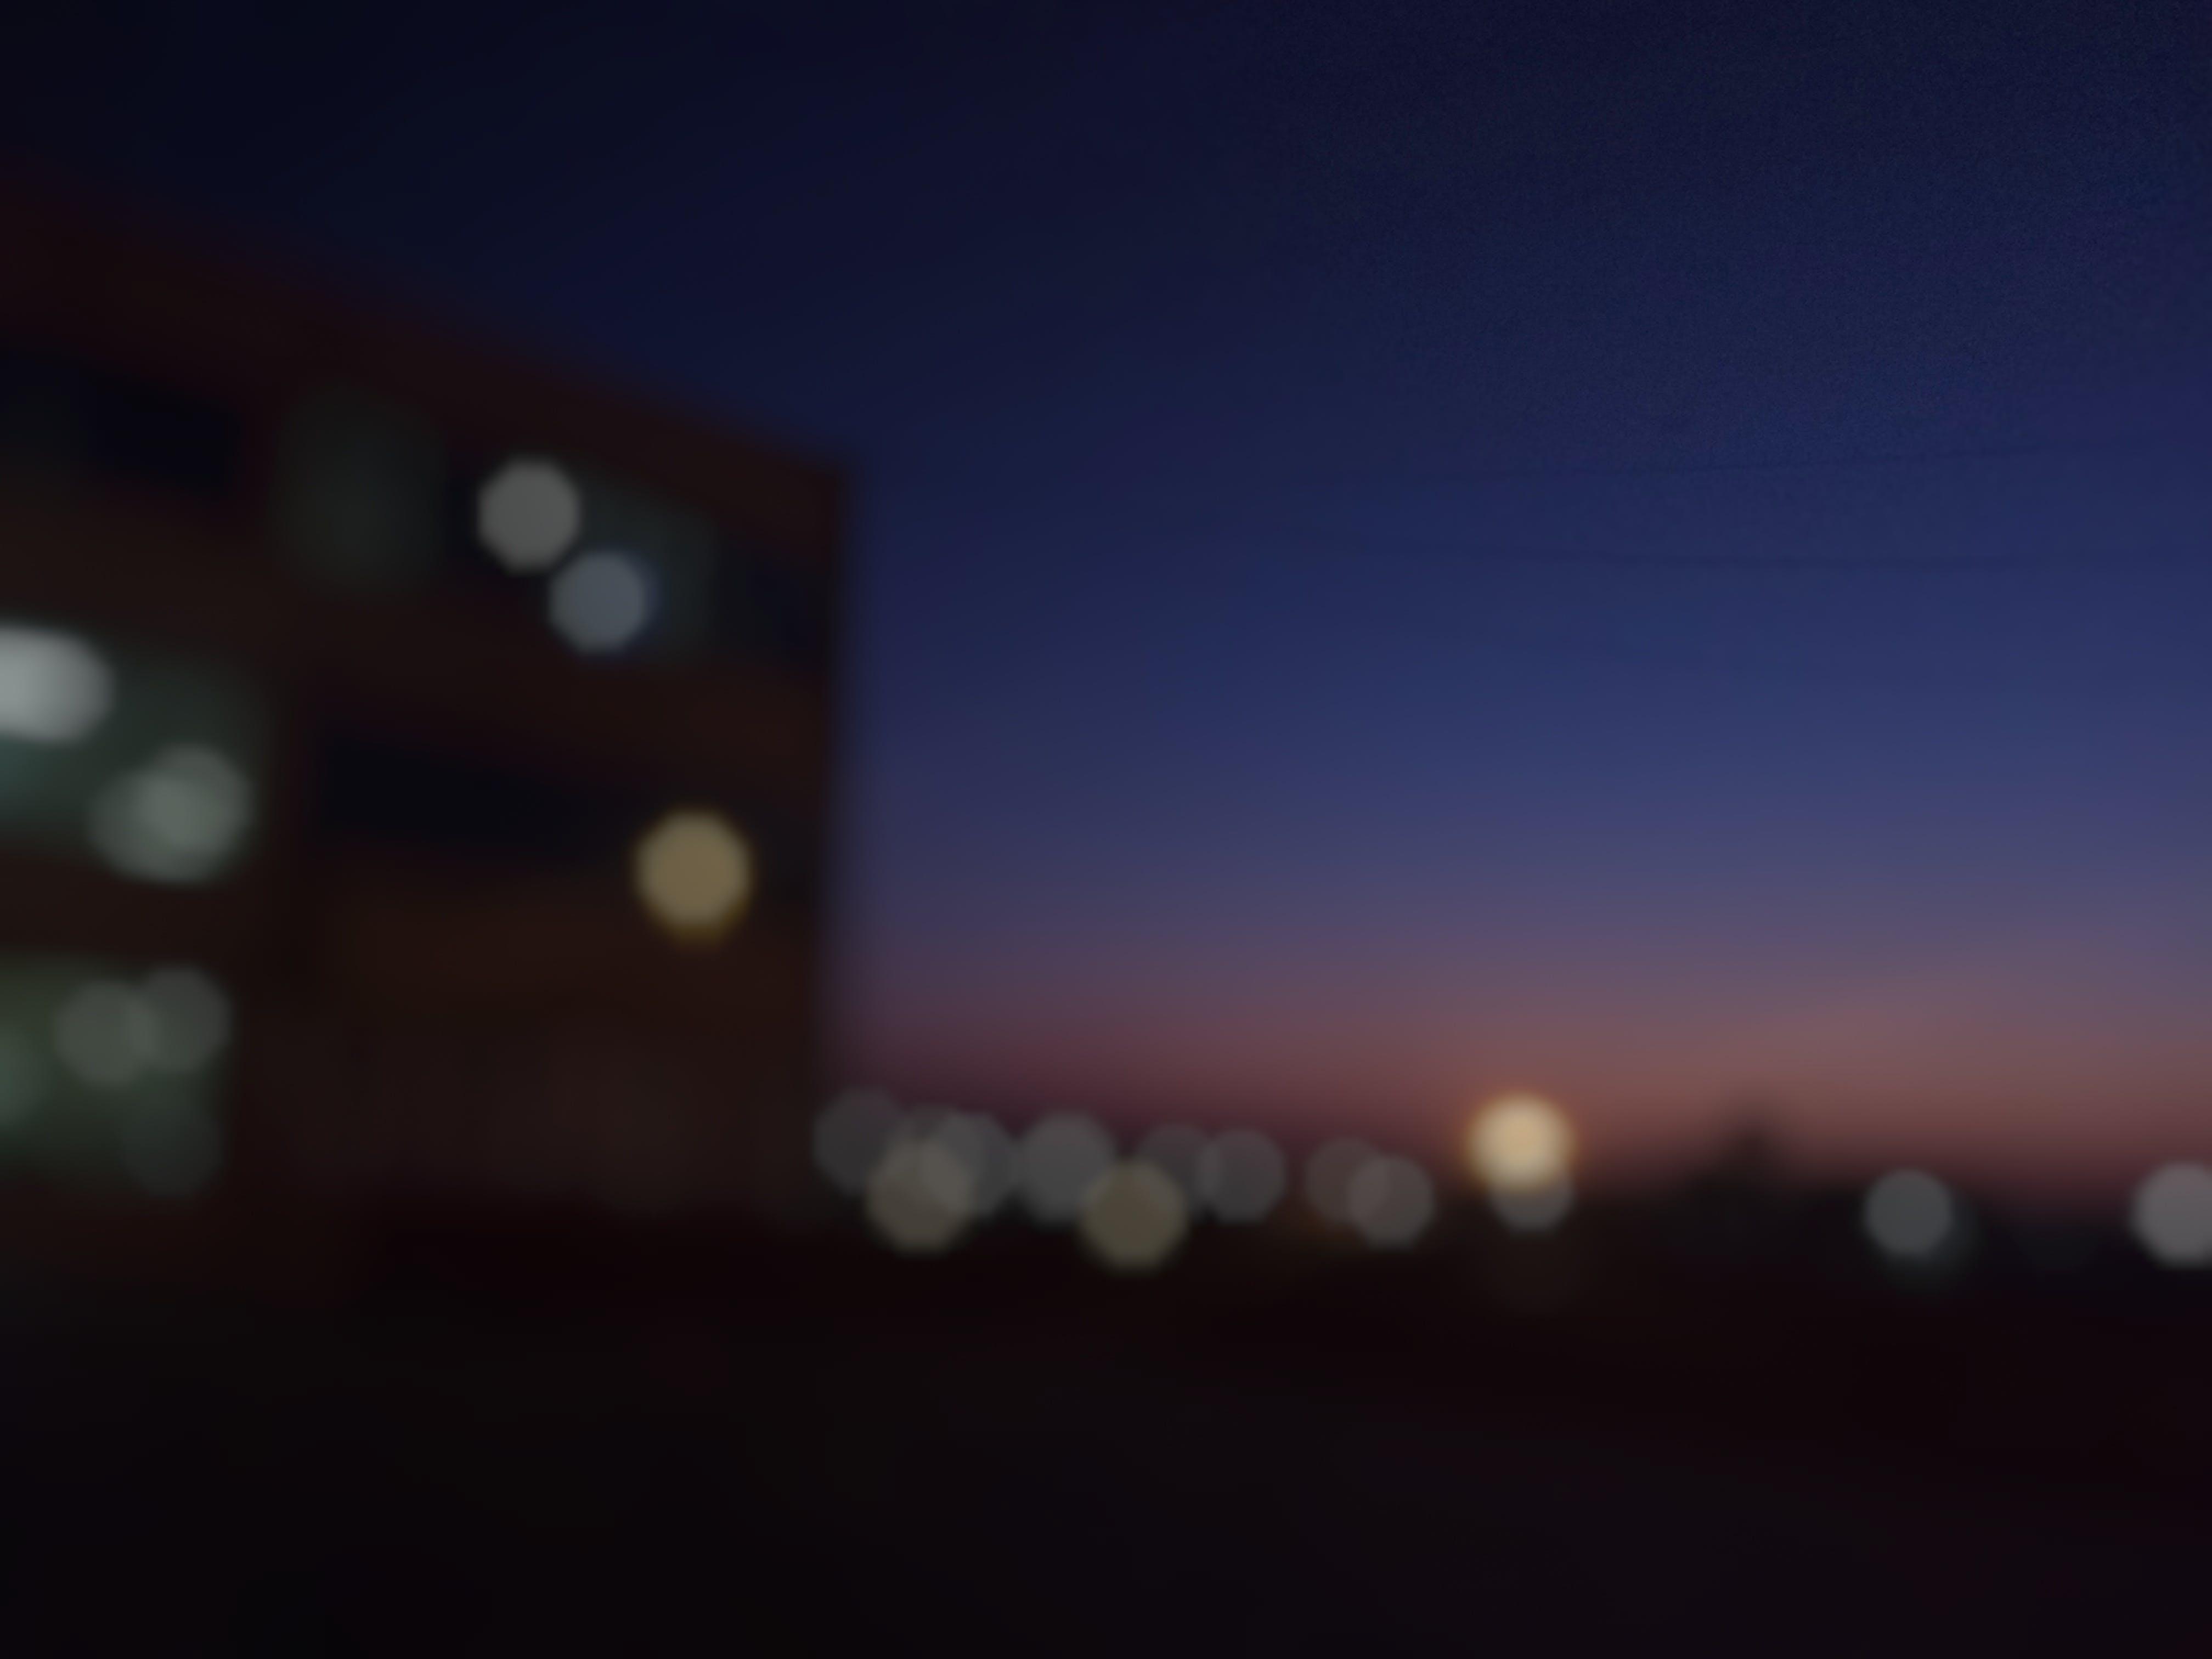 Free stock photo of #city #cityvibes #patna #bokeh